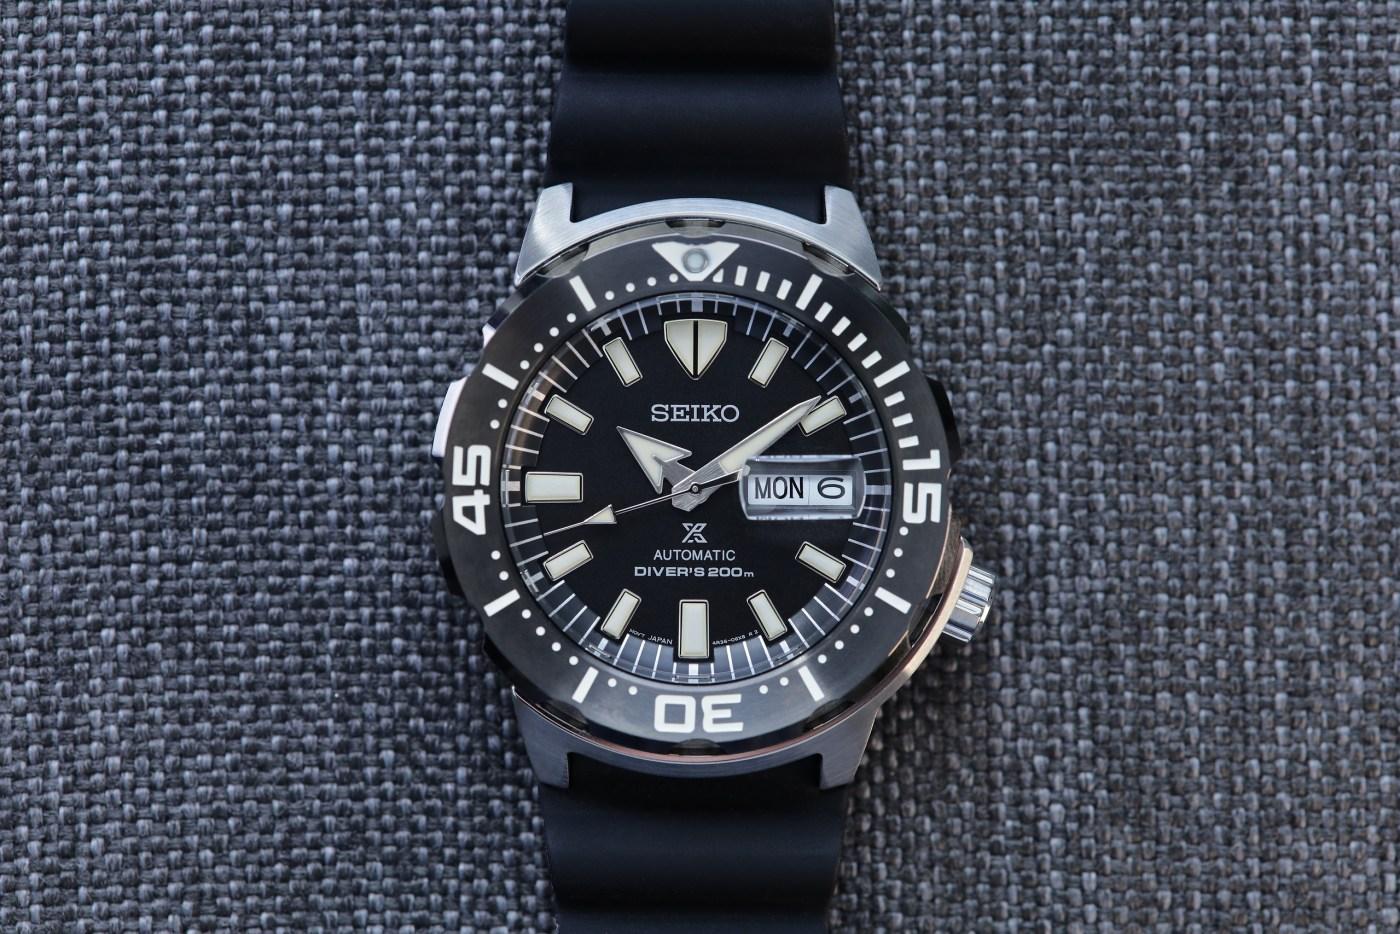 Seiko Prospex Ref SRPD27 Monster Automatic Diver